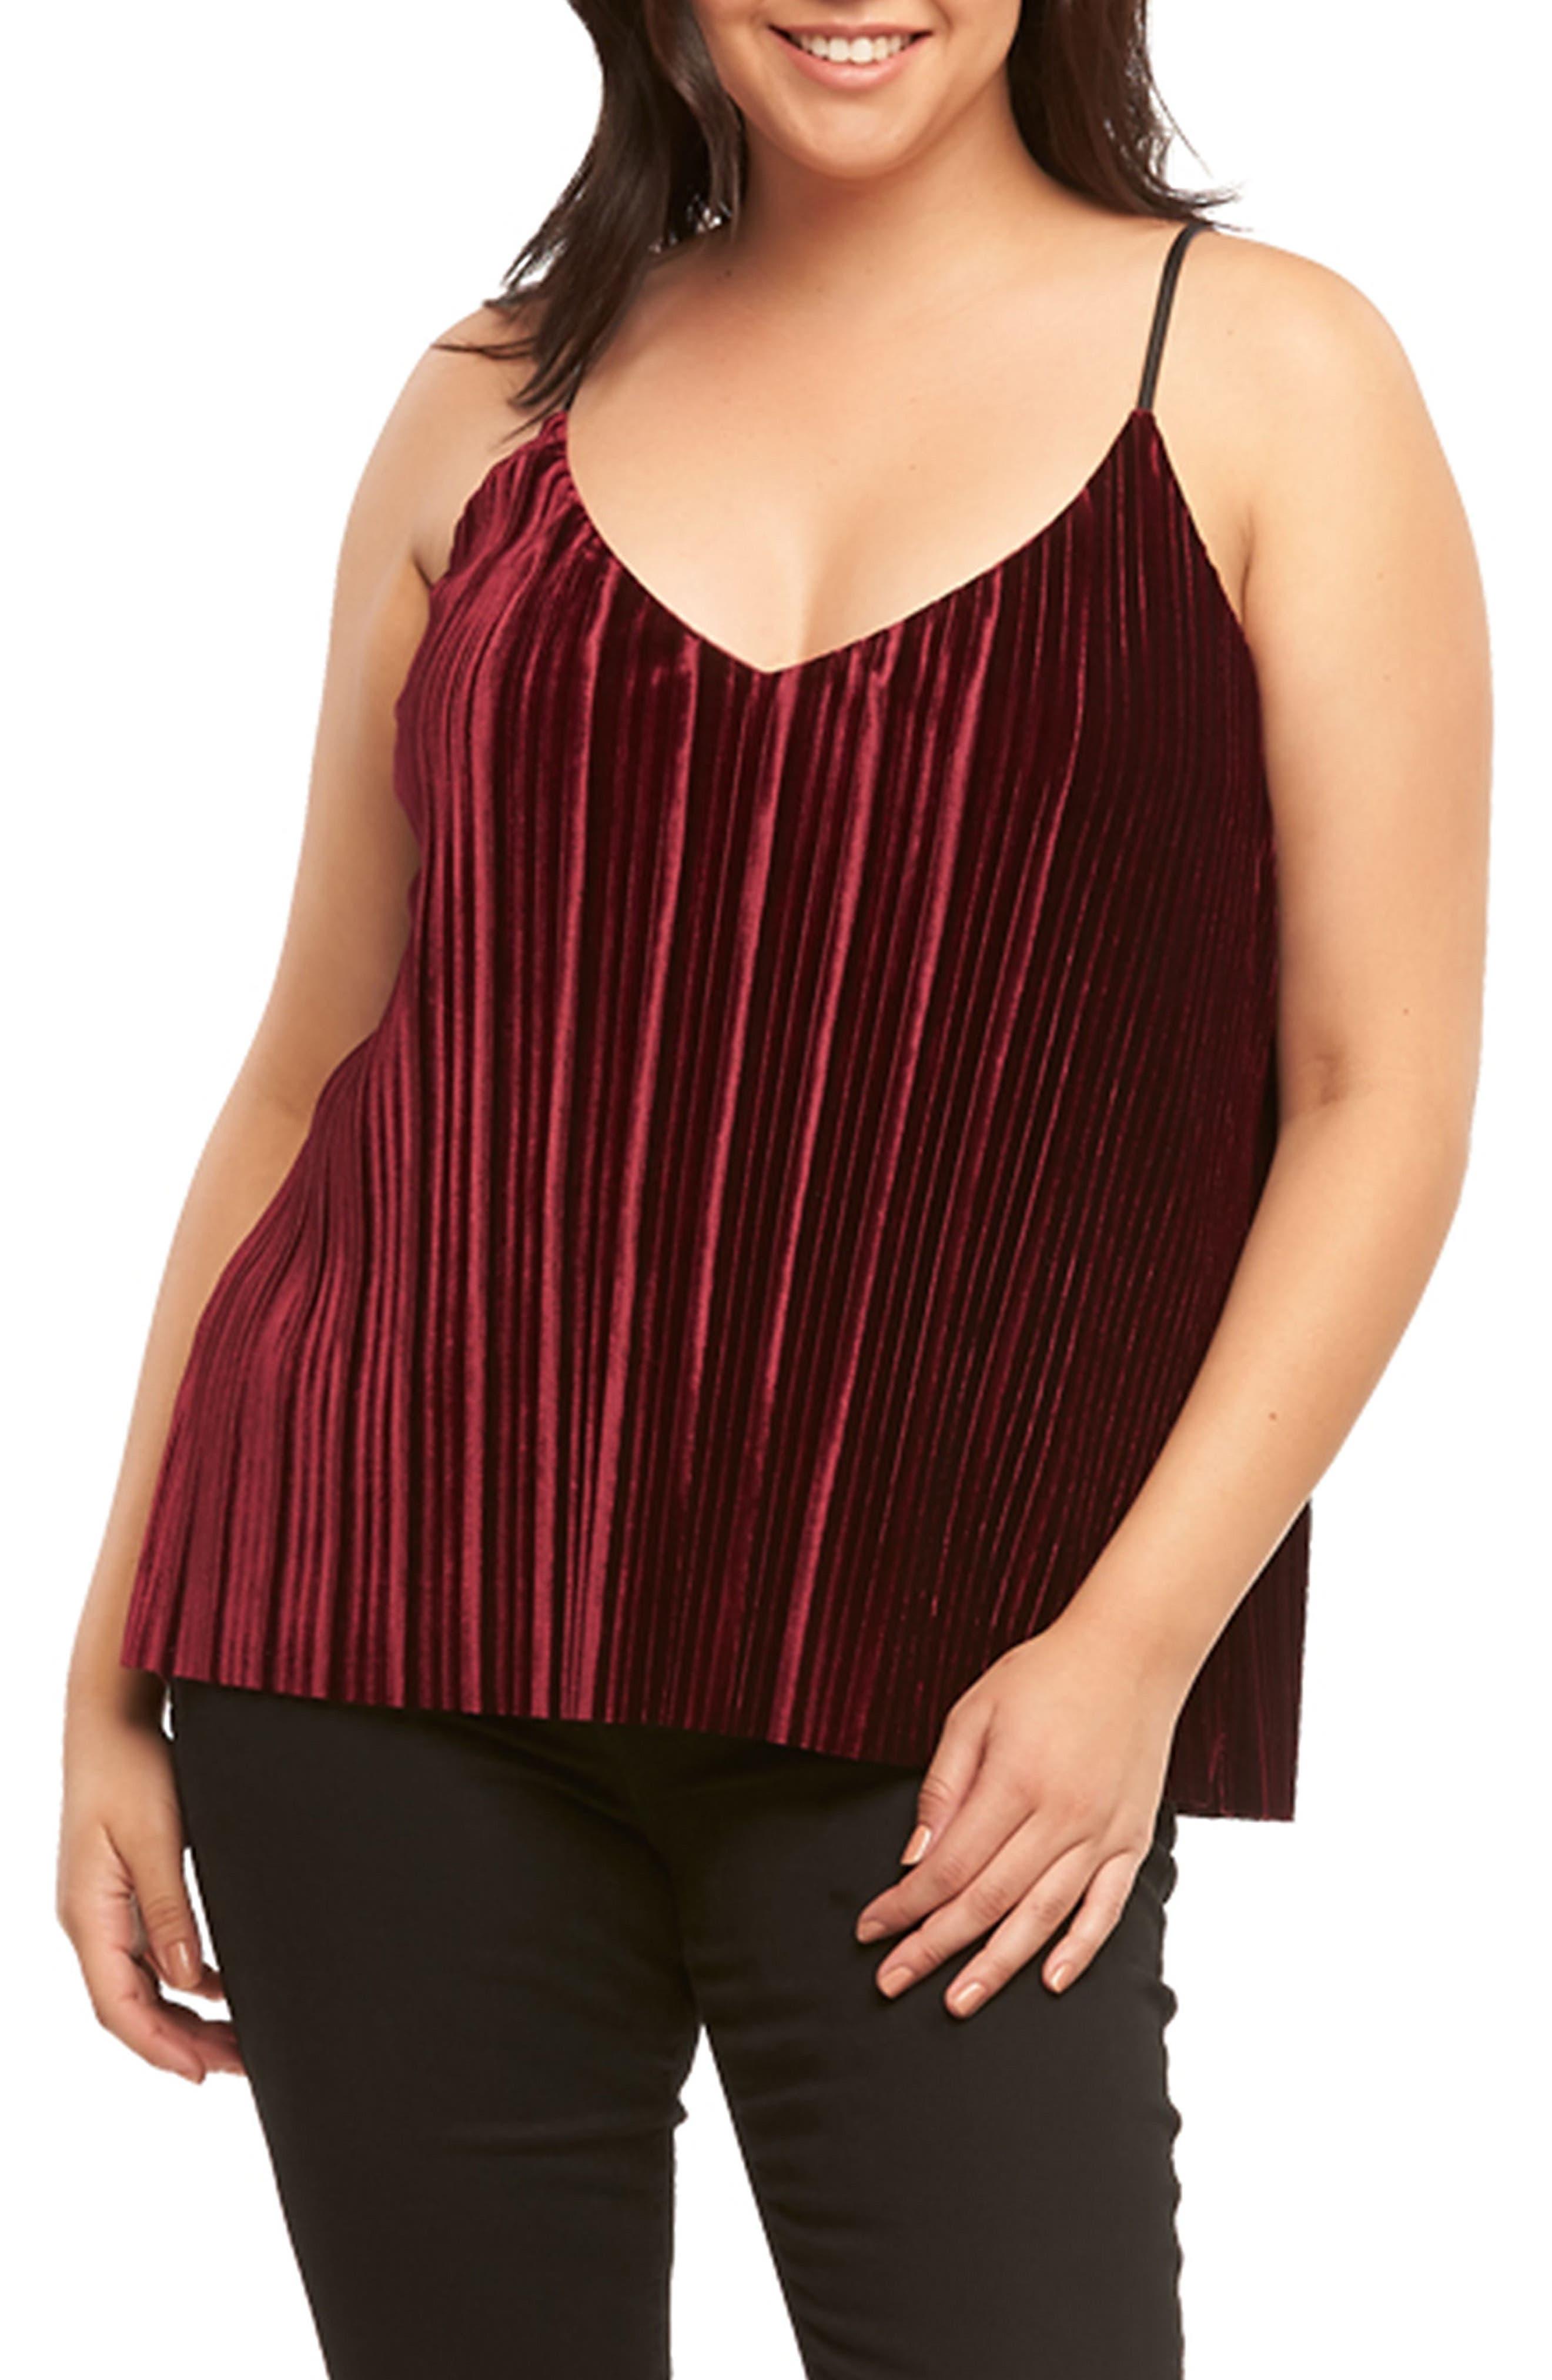 Alternate Image 1 Selected - Tart Maren Pleat Velvet Camisole (Plus Size)